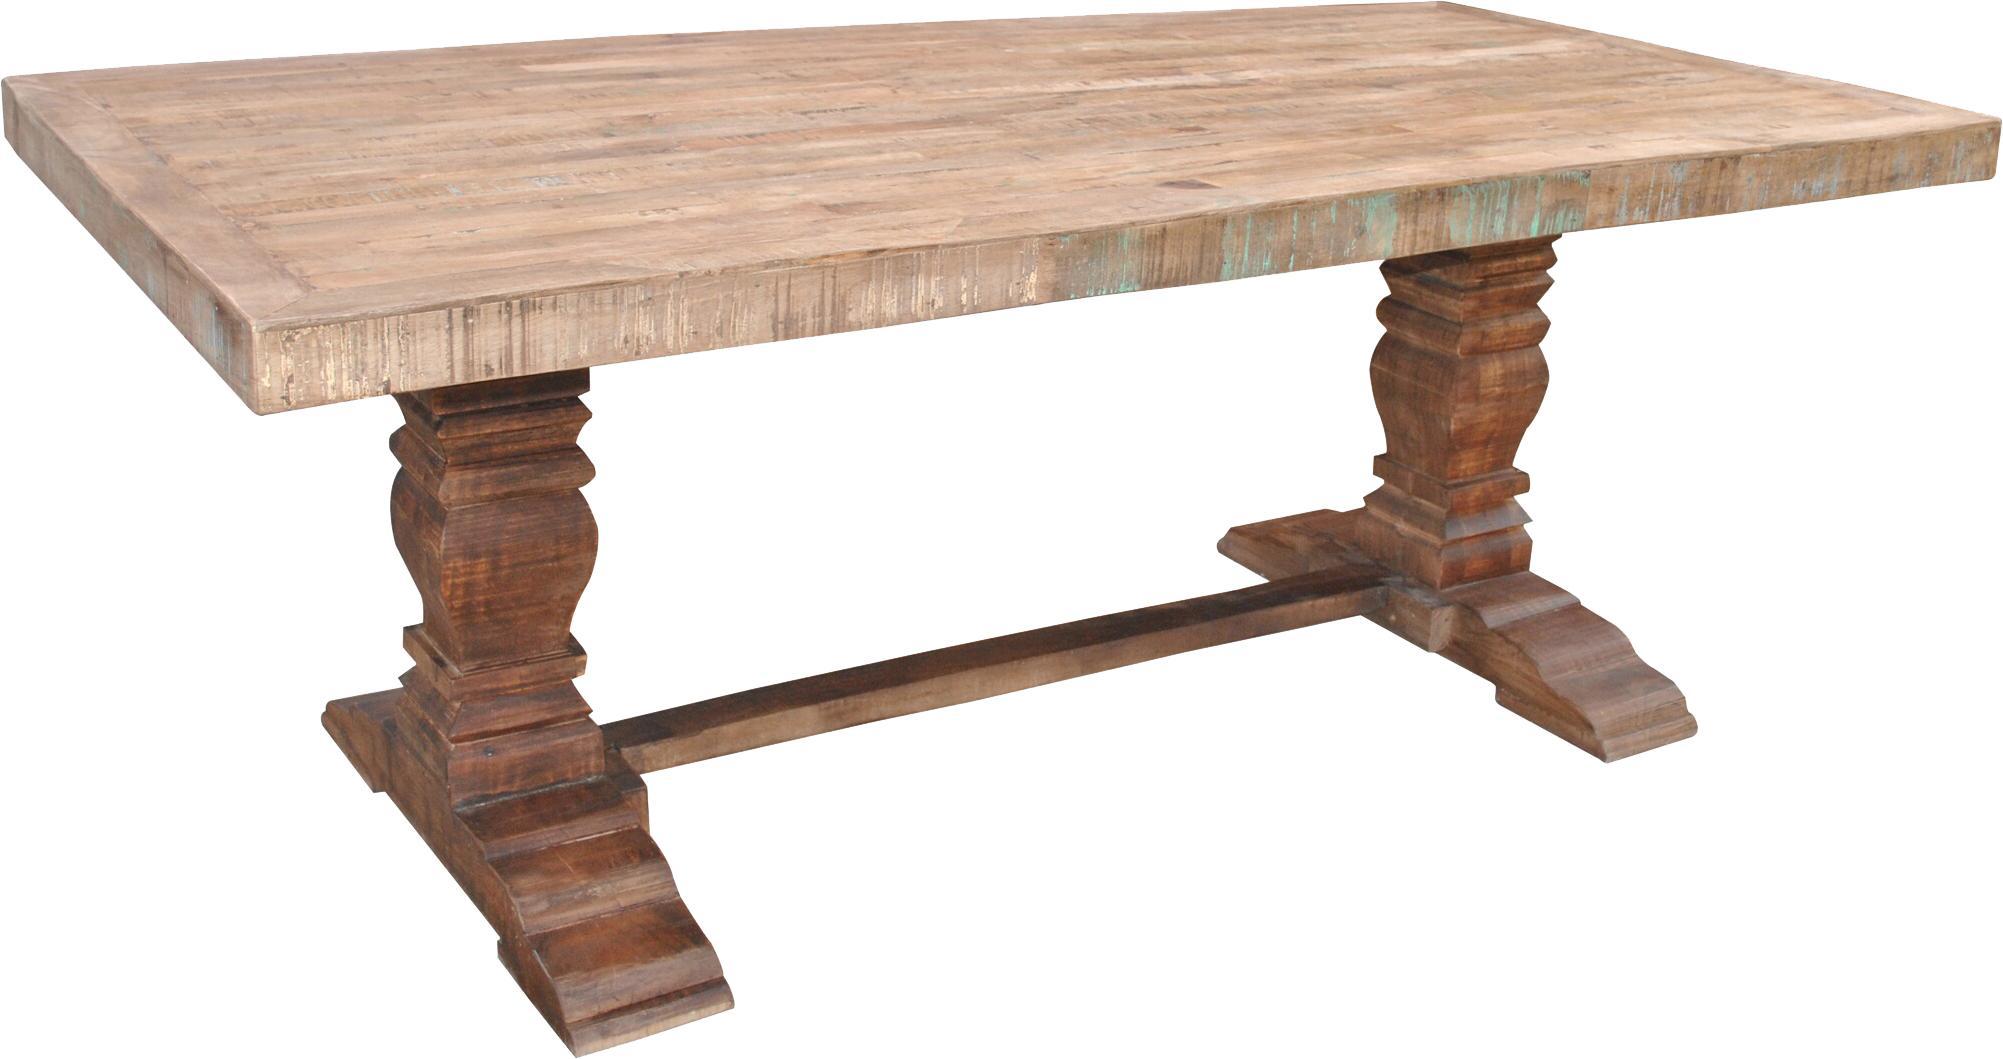 Jaipur furniture guru vintage pedestal dining table Pedestal dining table